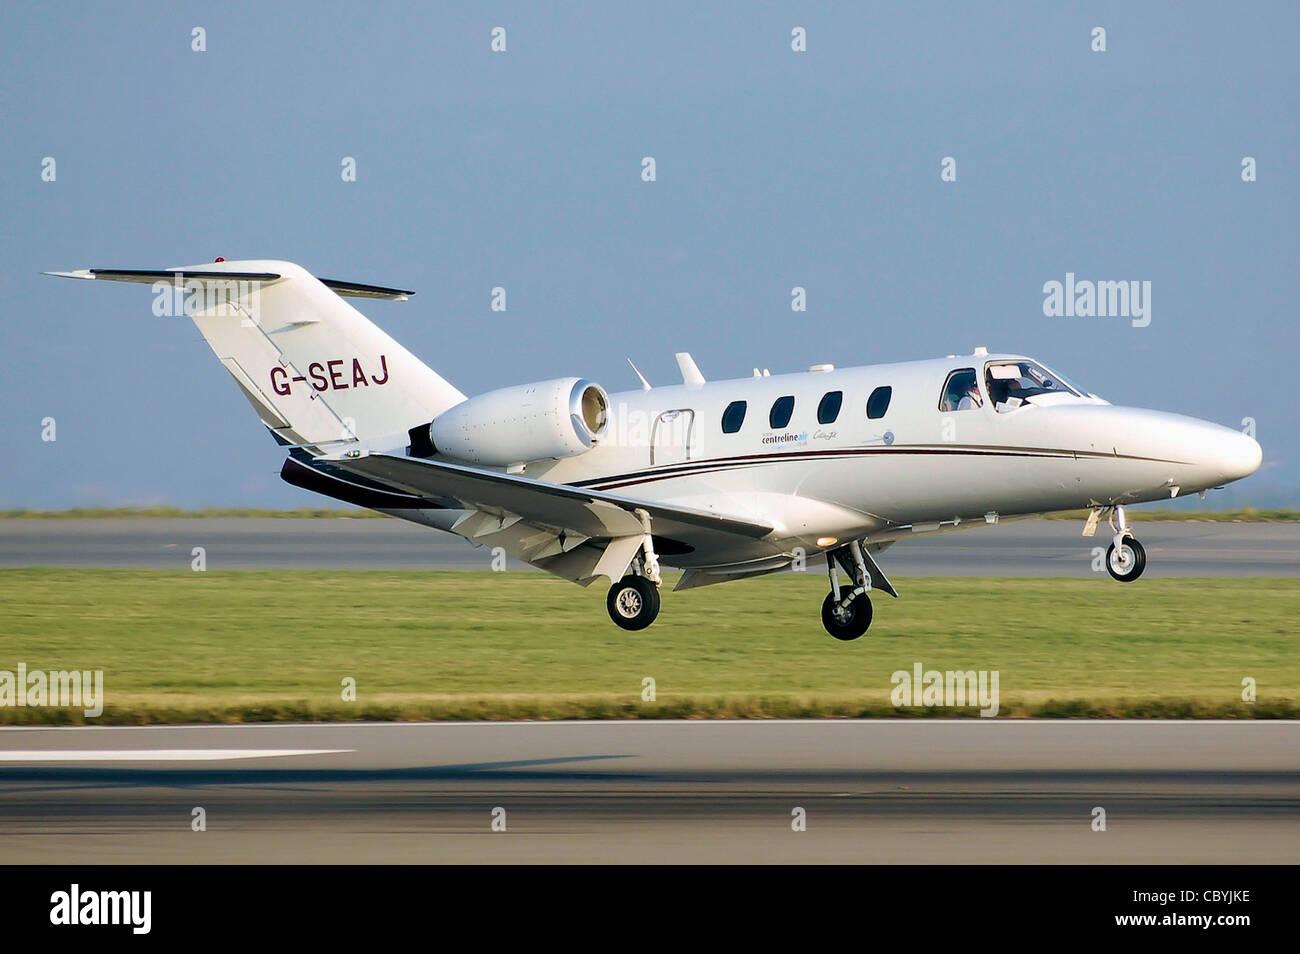 Centreline Air Charter Cessna 525 CitationJet (G-SEAJ) lands at Bristol International Airport, England. - Stock Image